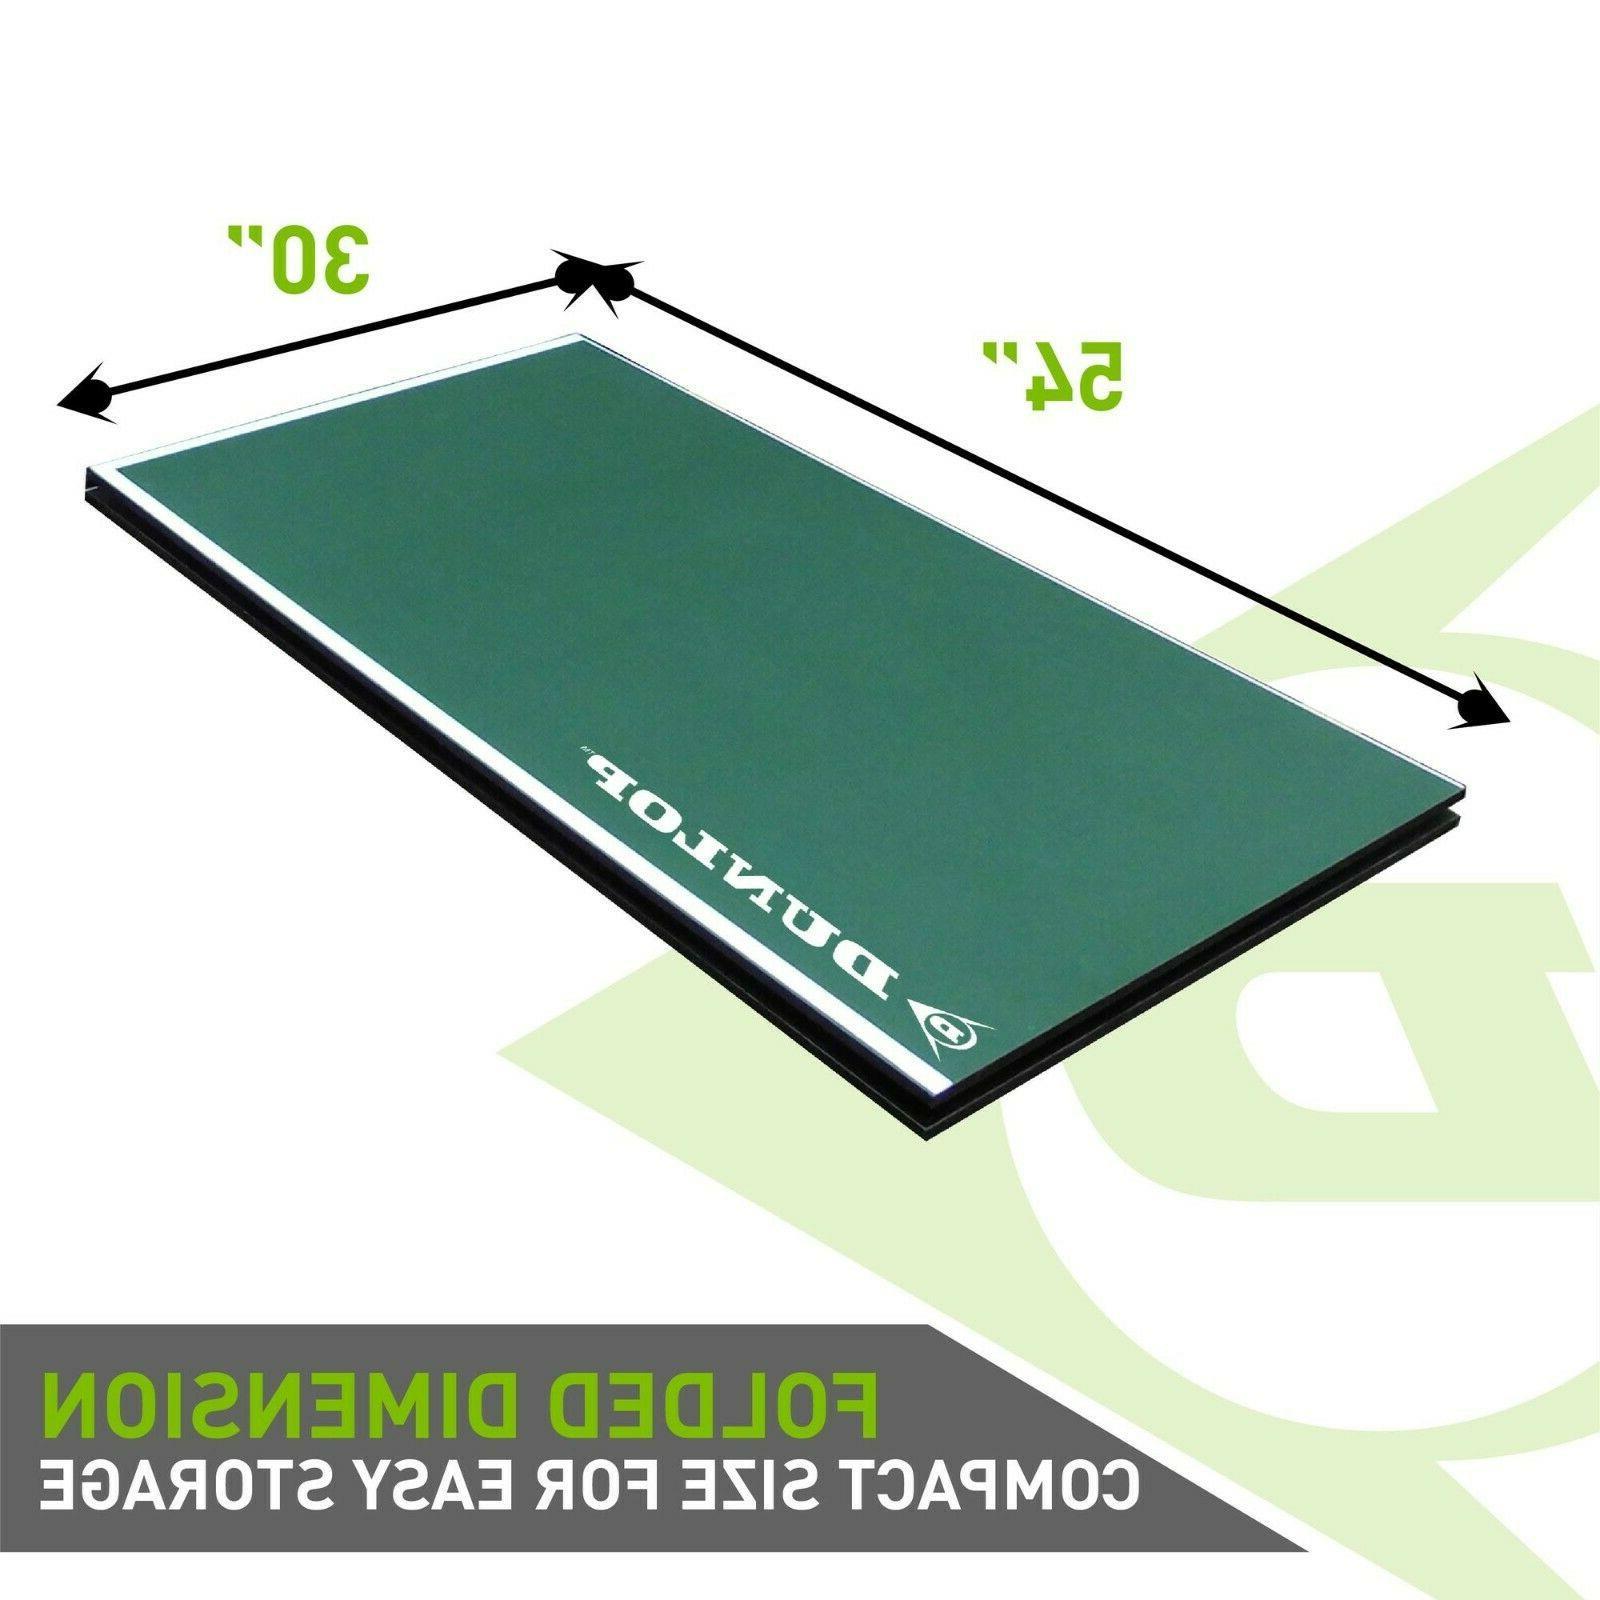 Table Tennis Official Post Net Assembled Handy